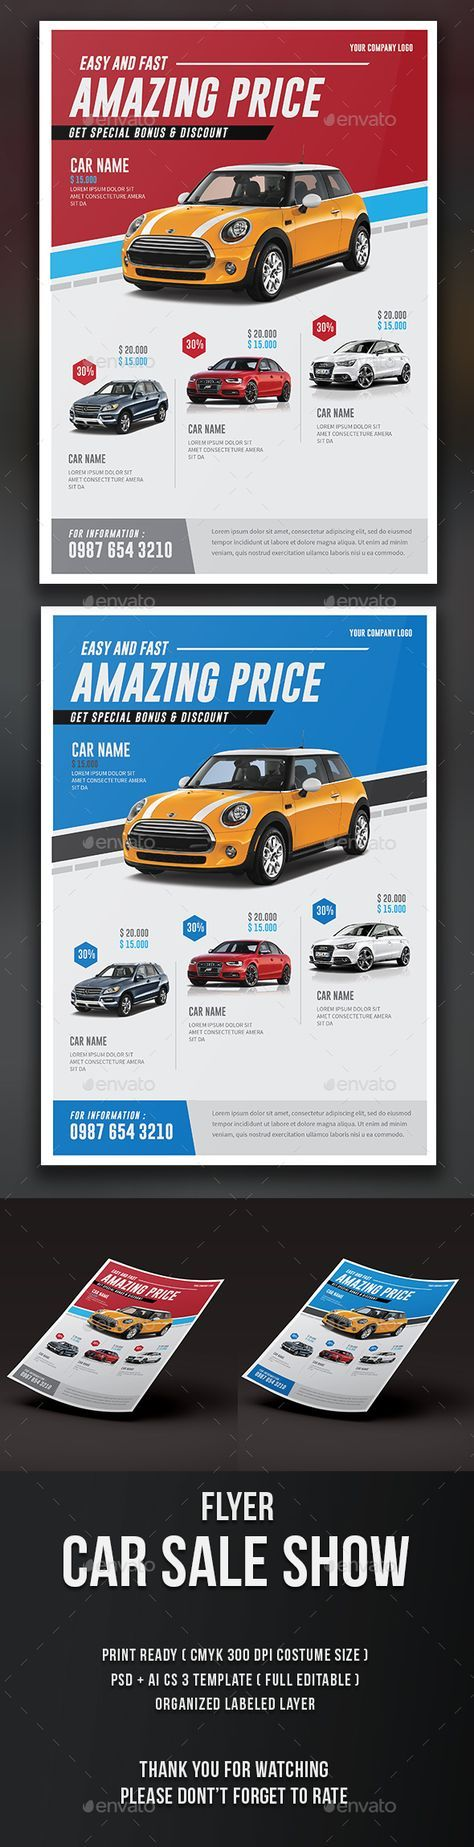 Best Poster Images On   User Interface Design